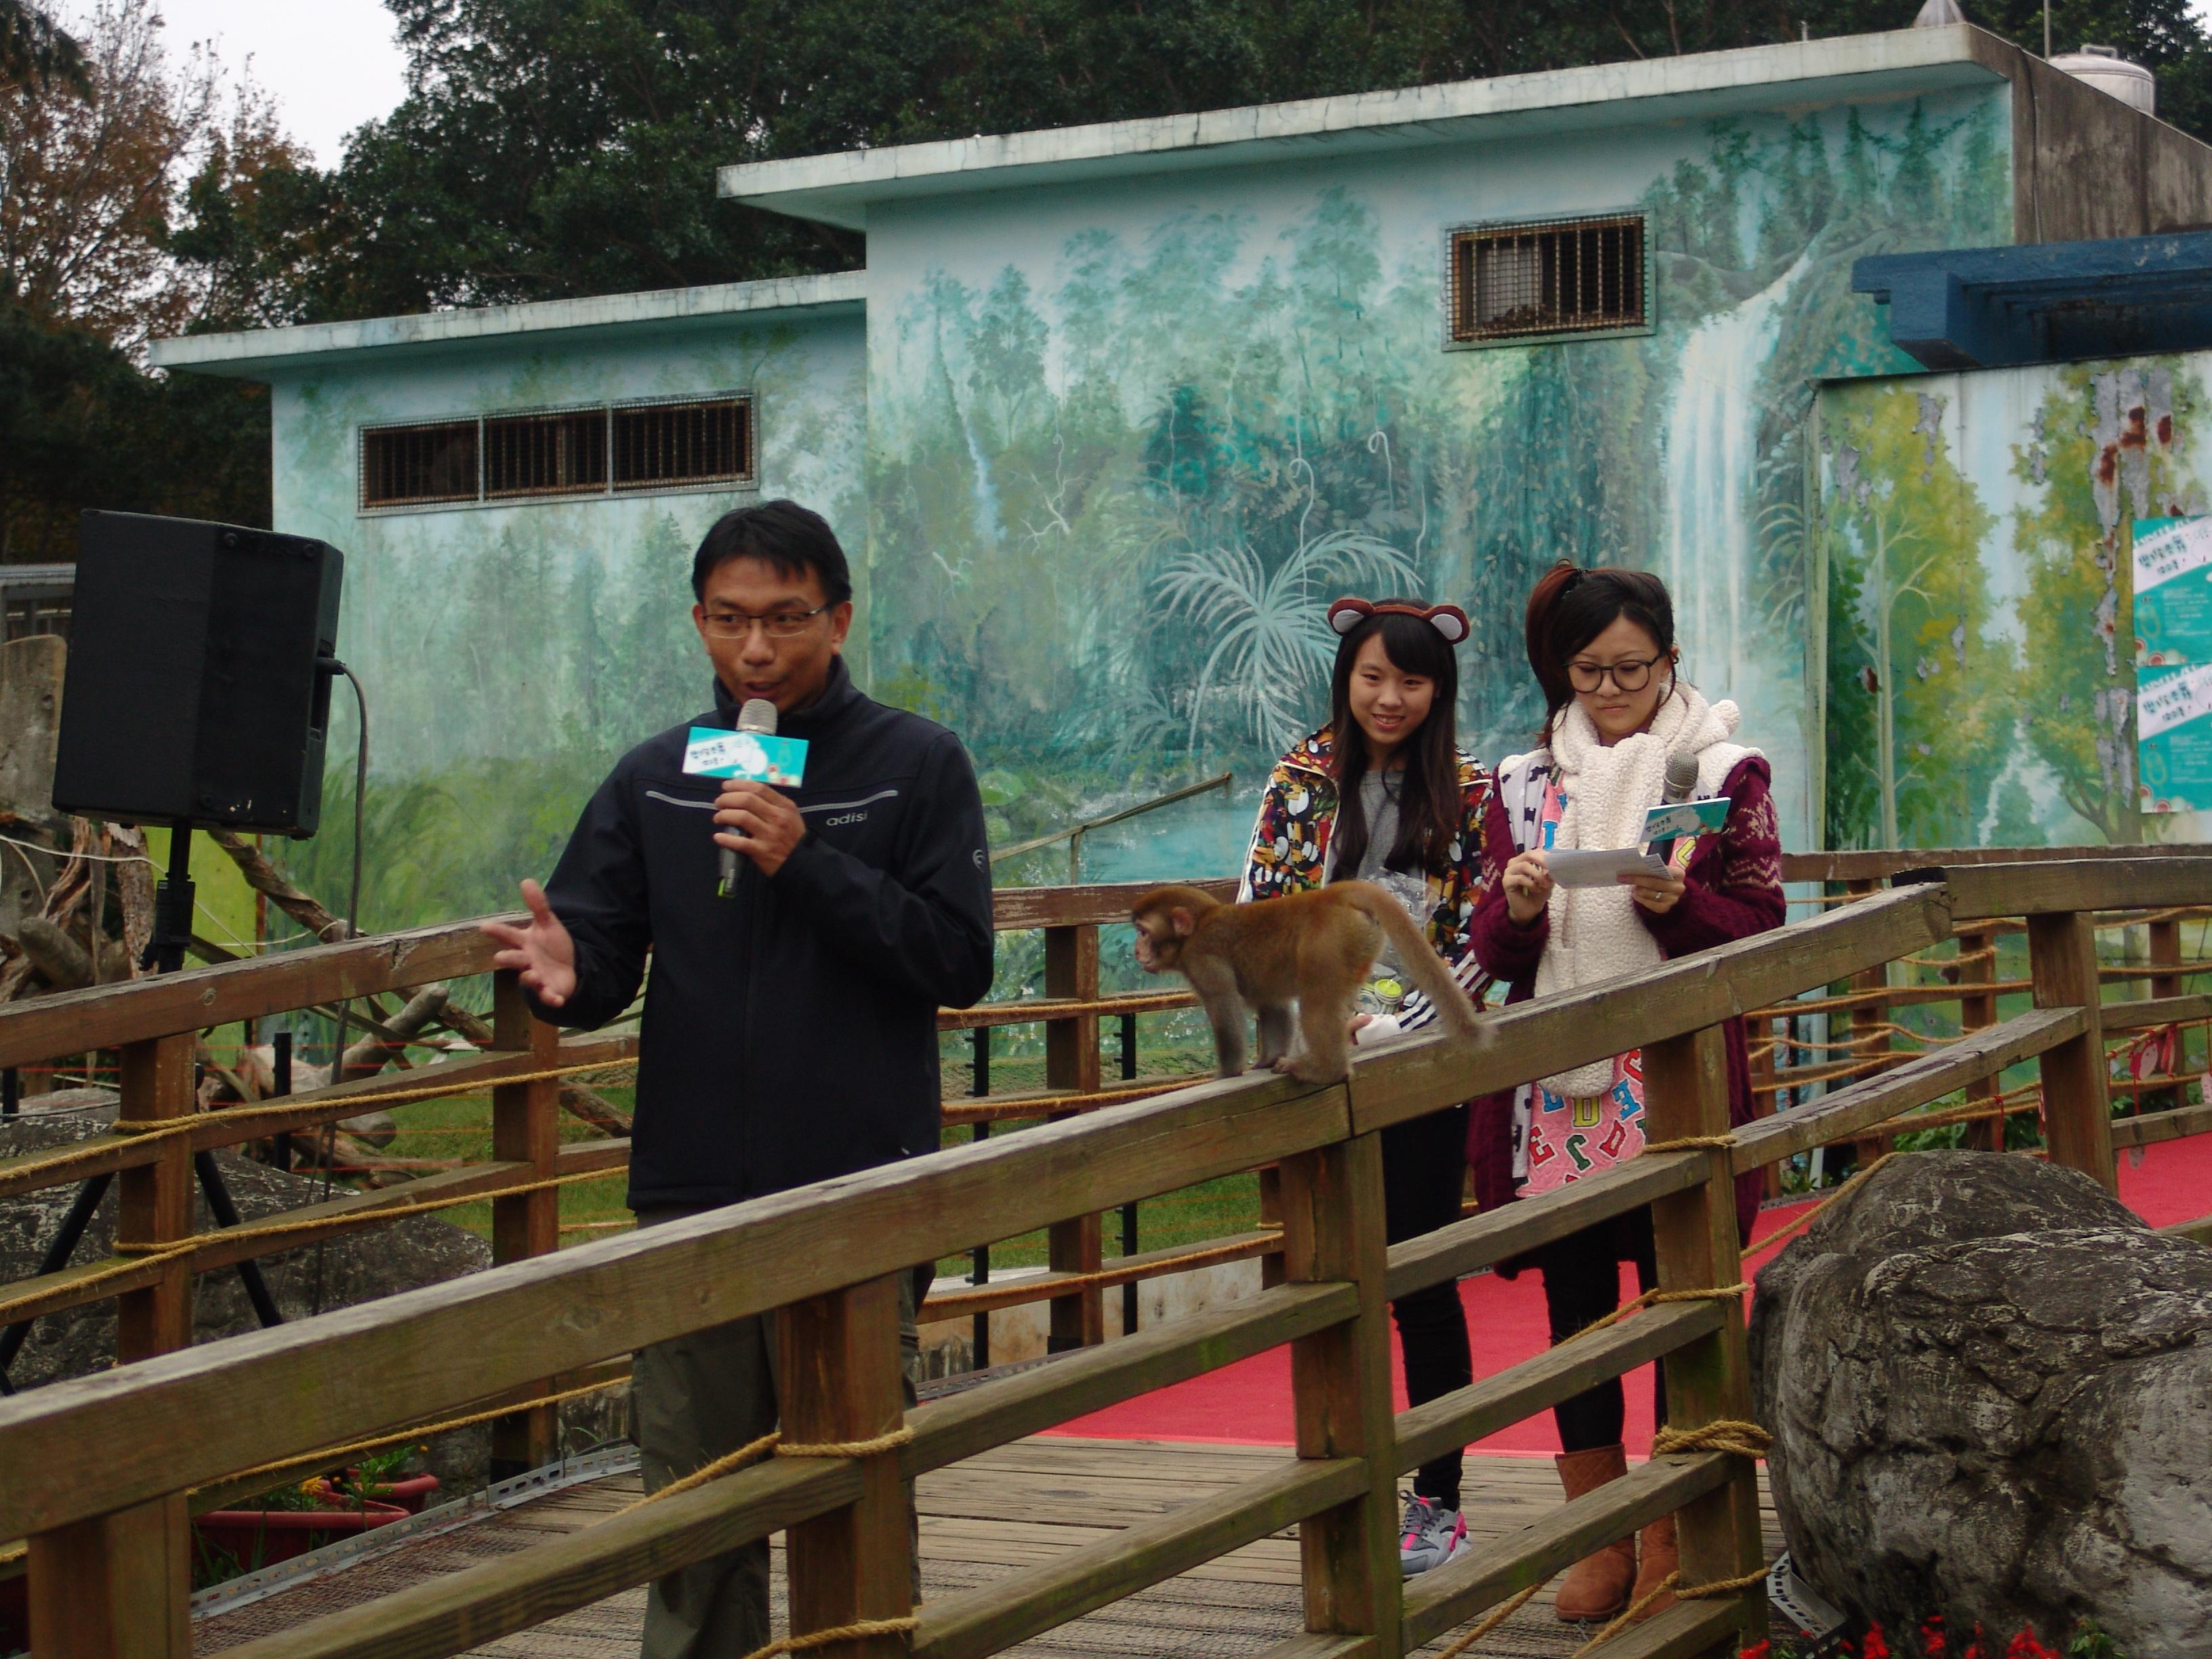 新竹动物园春节活动